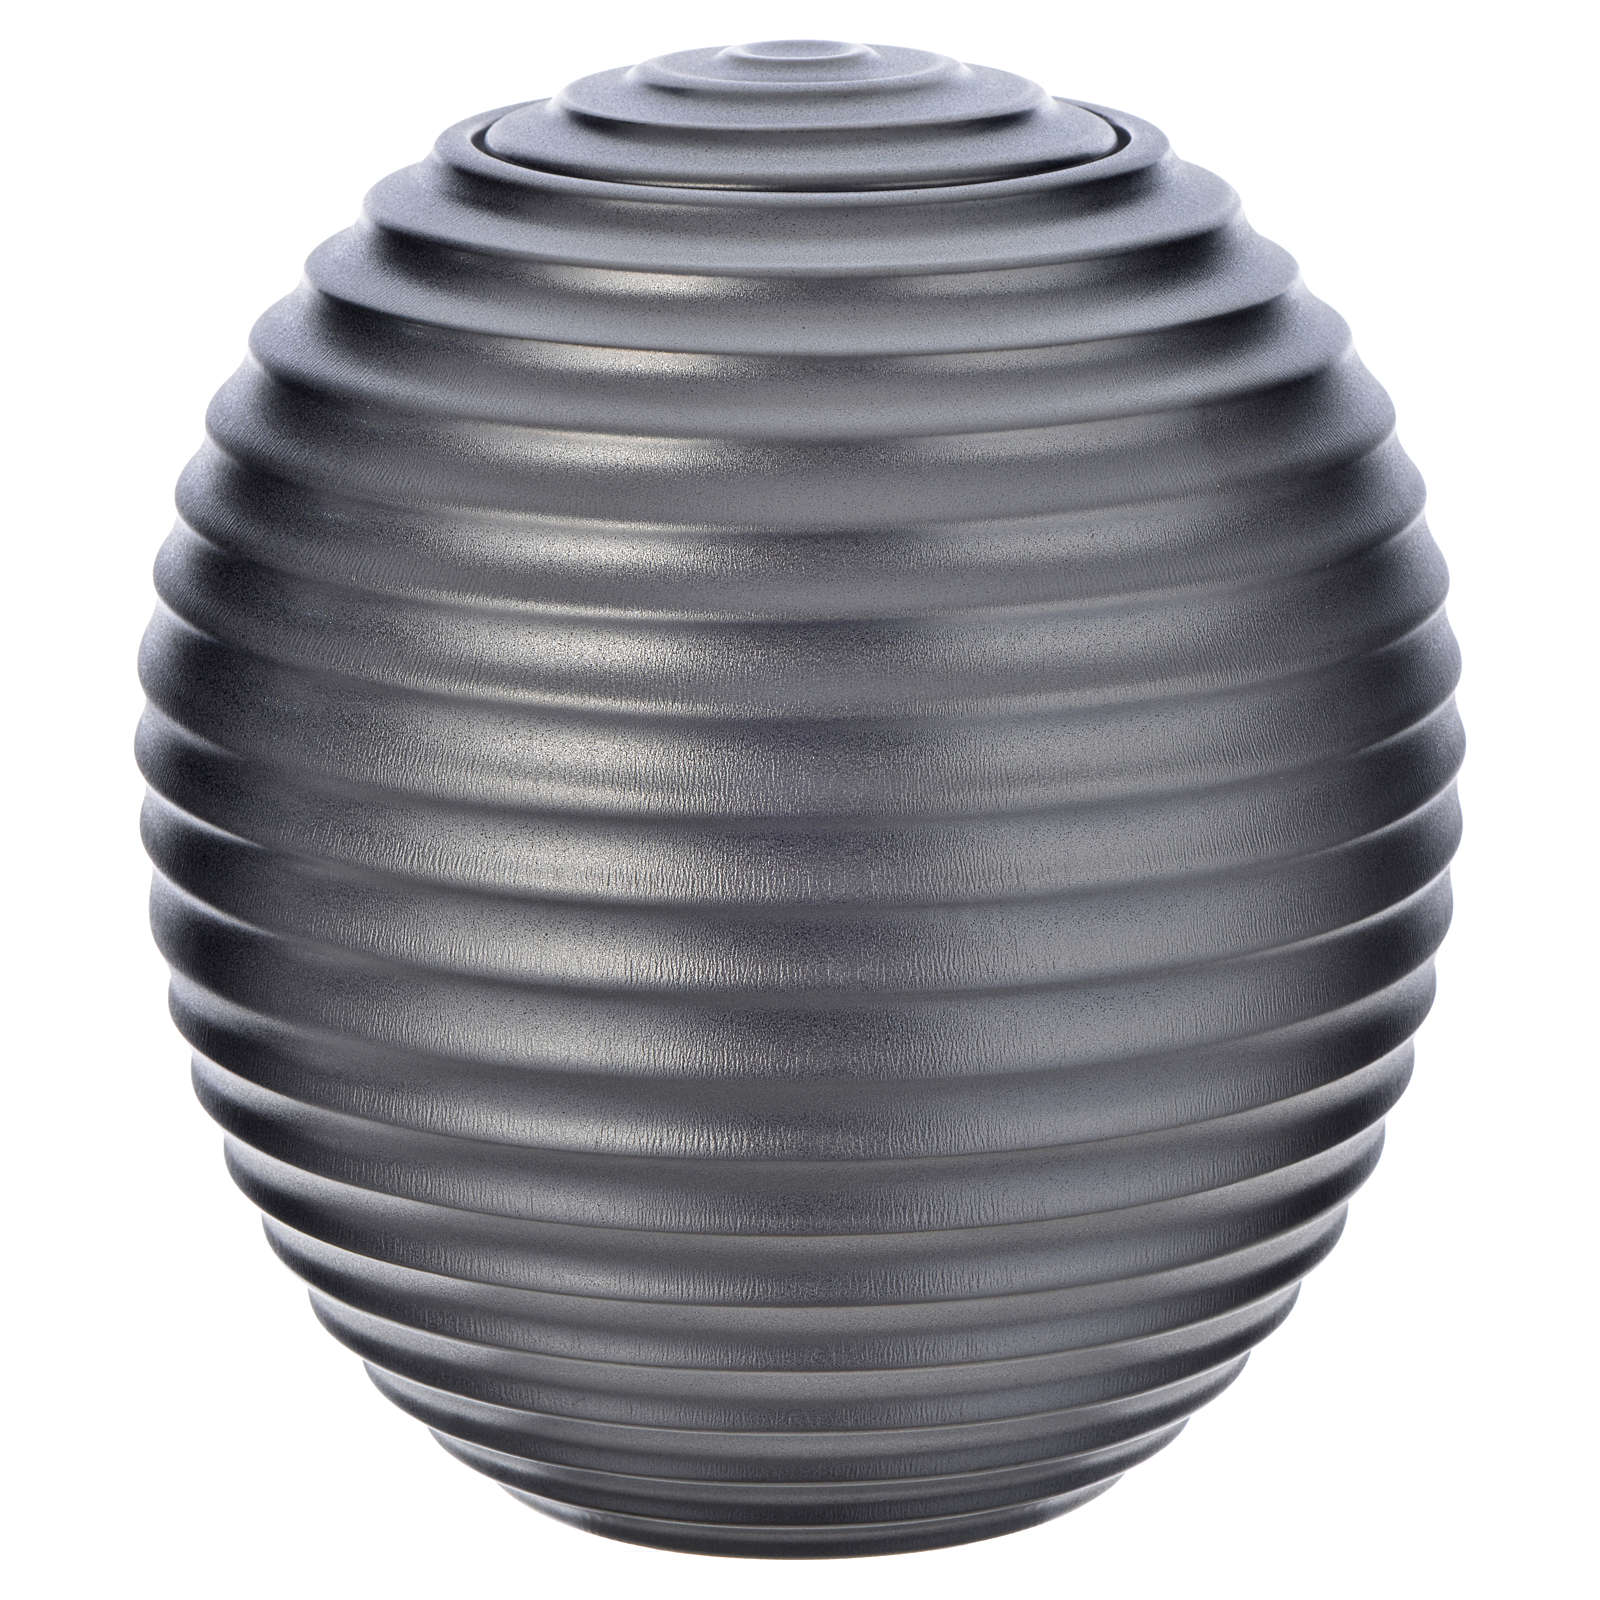 Urna cineraria porcelana esmaltada mod. Plata Tecno 3